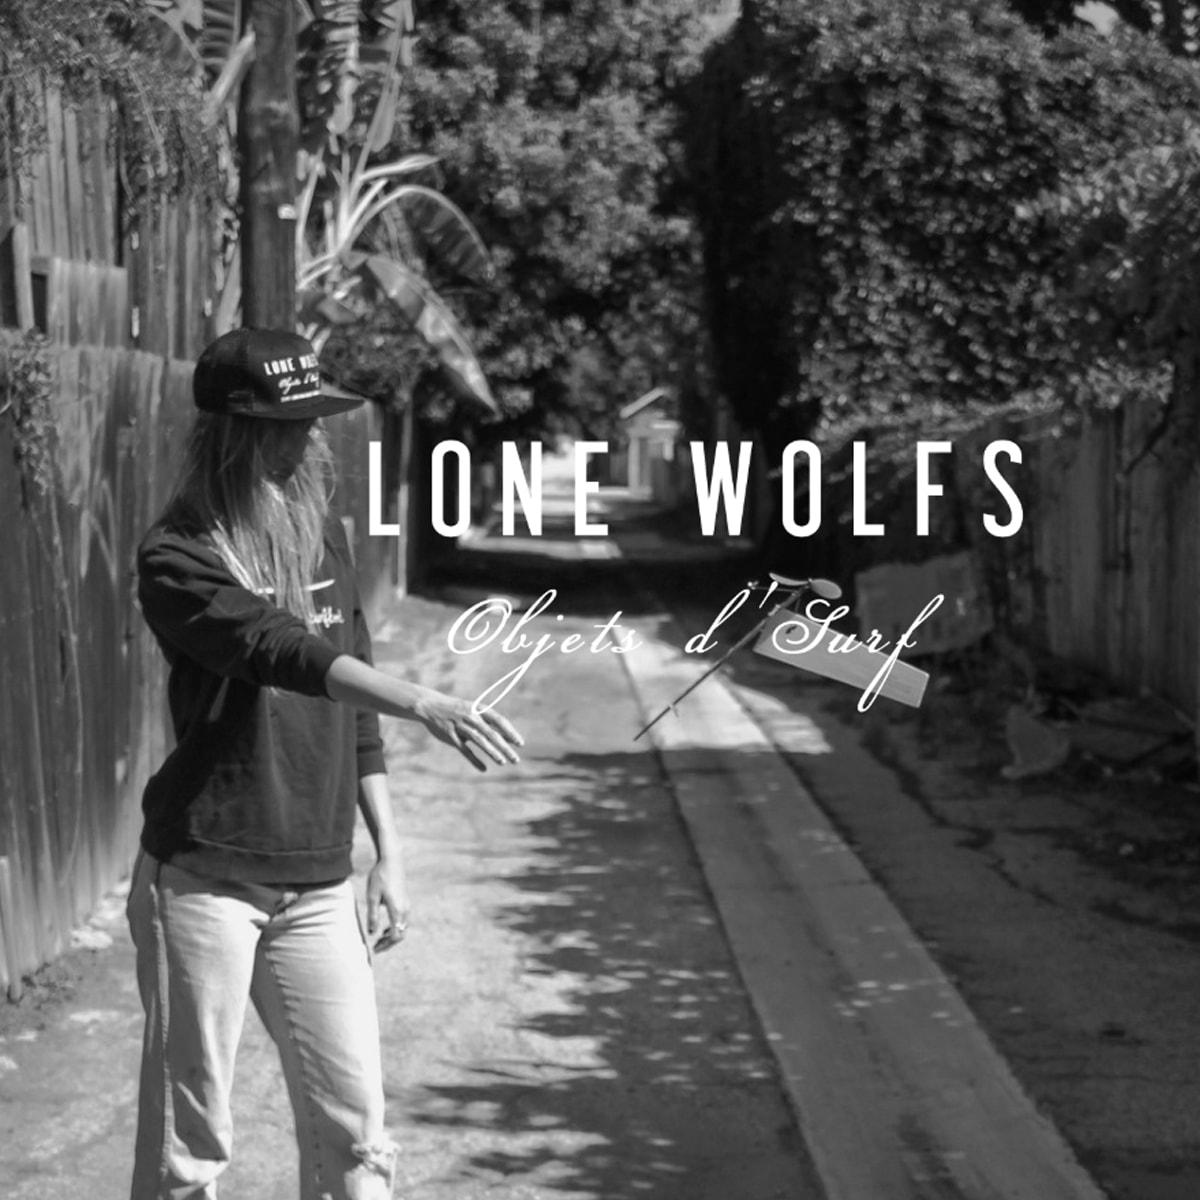 LONE WOLFS Objets d'Surf,ローンウルフズ